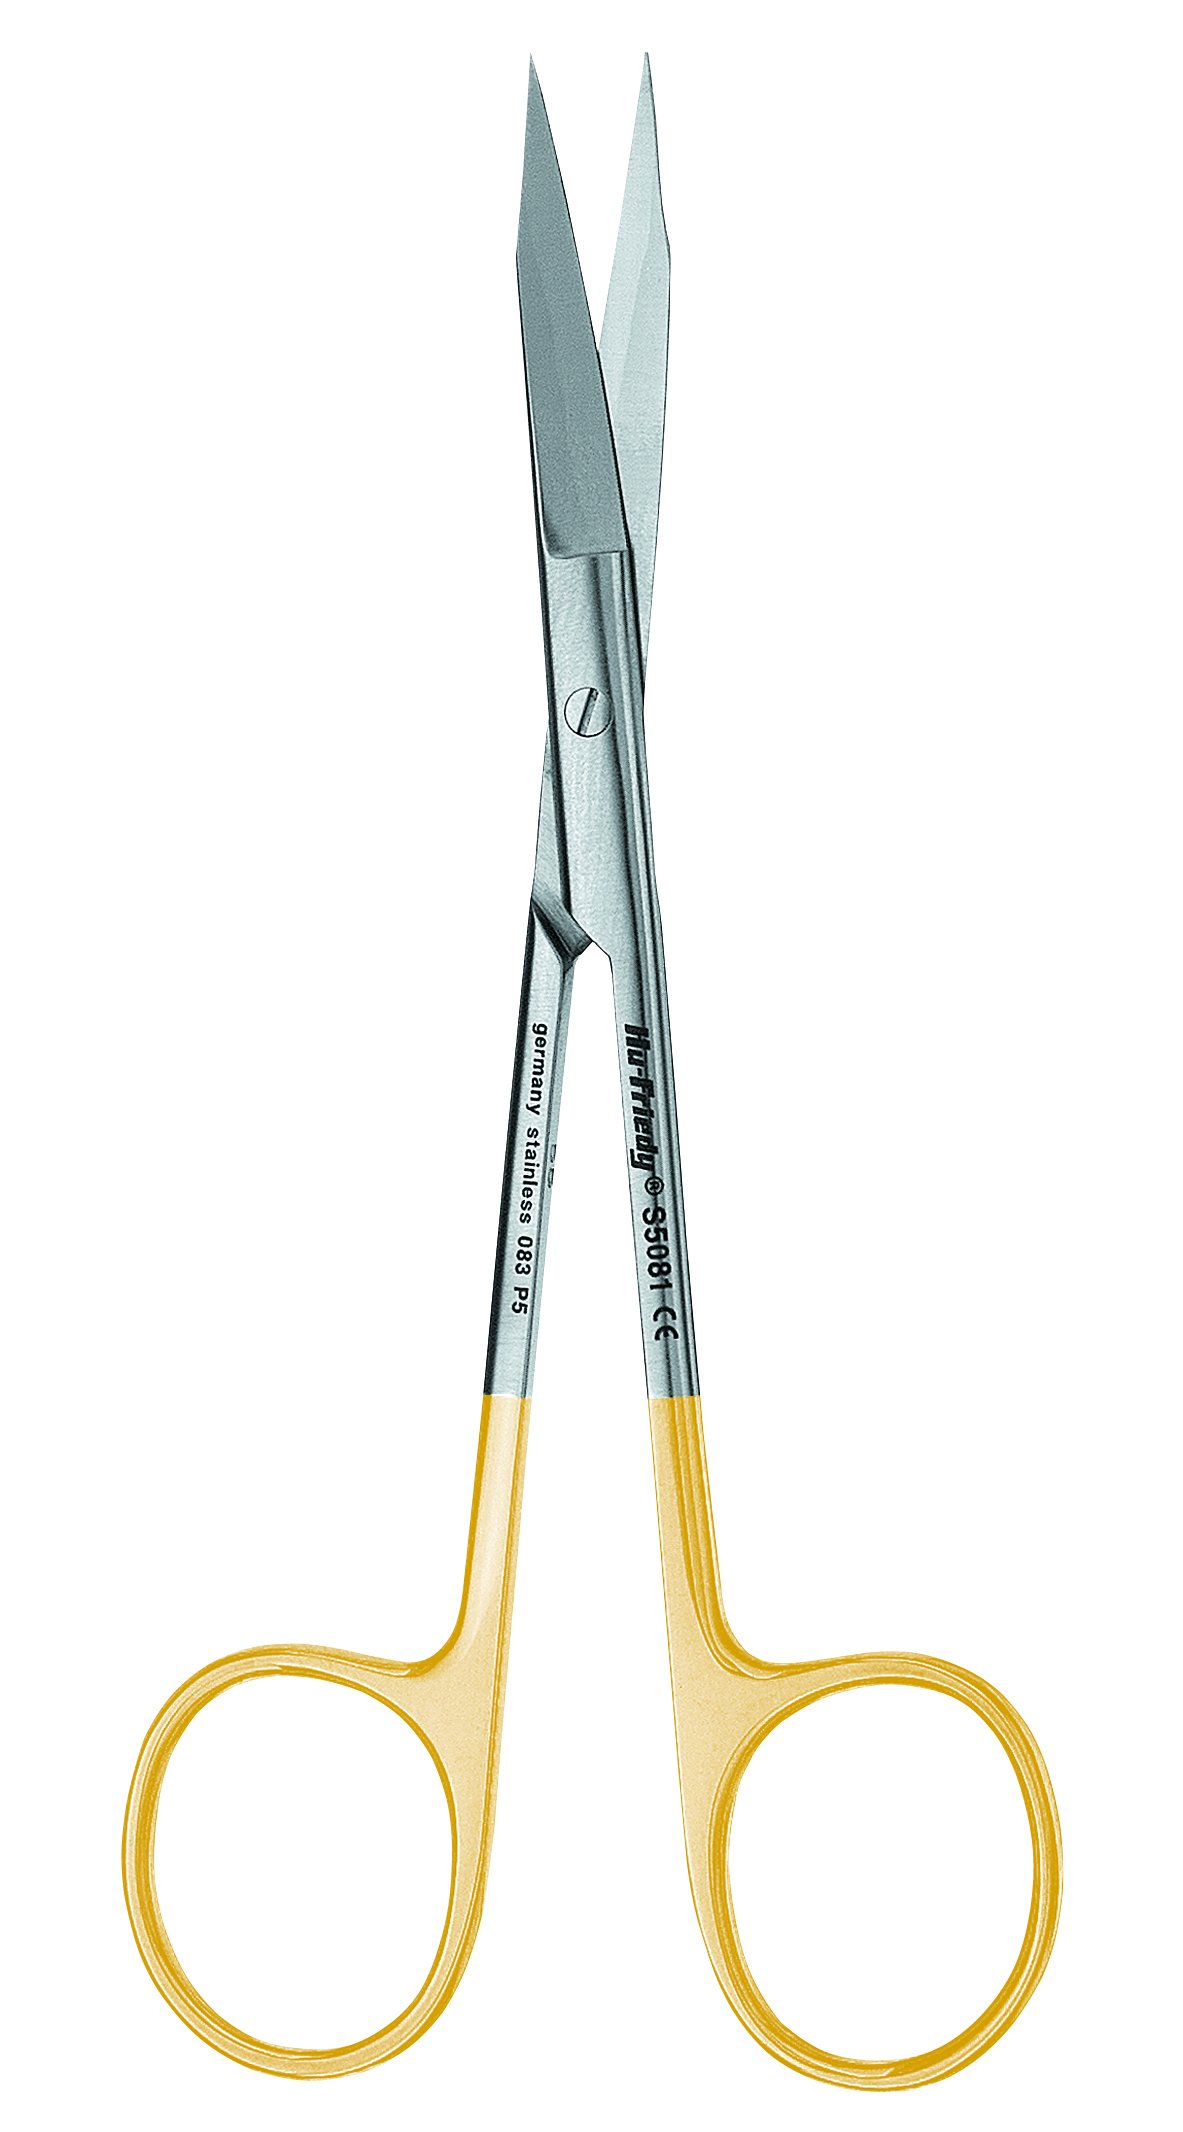 Hu-Friedy S5082 Straight Iris Perma Sharp Scissors, 11.5 cm/4.5''